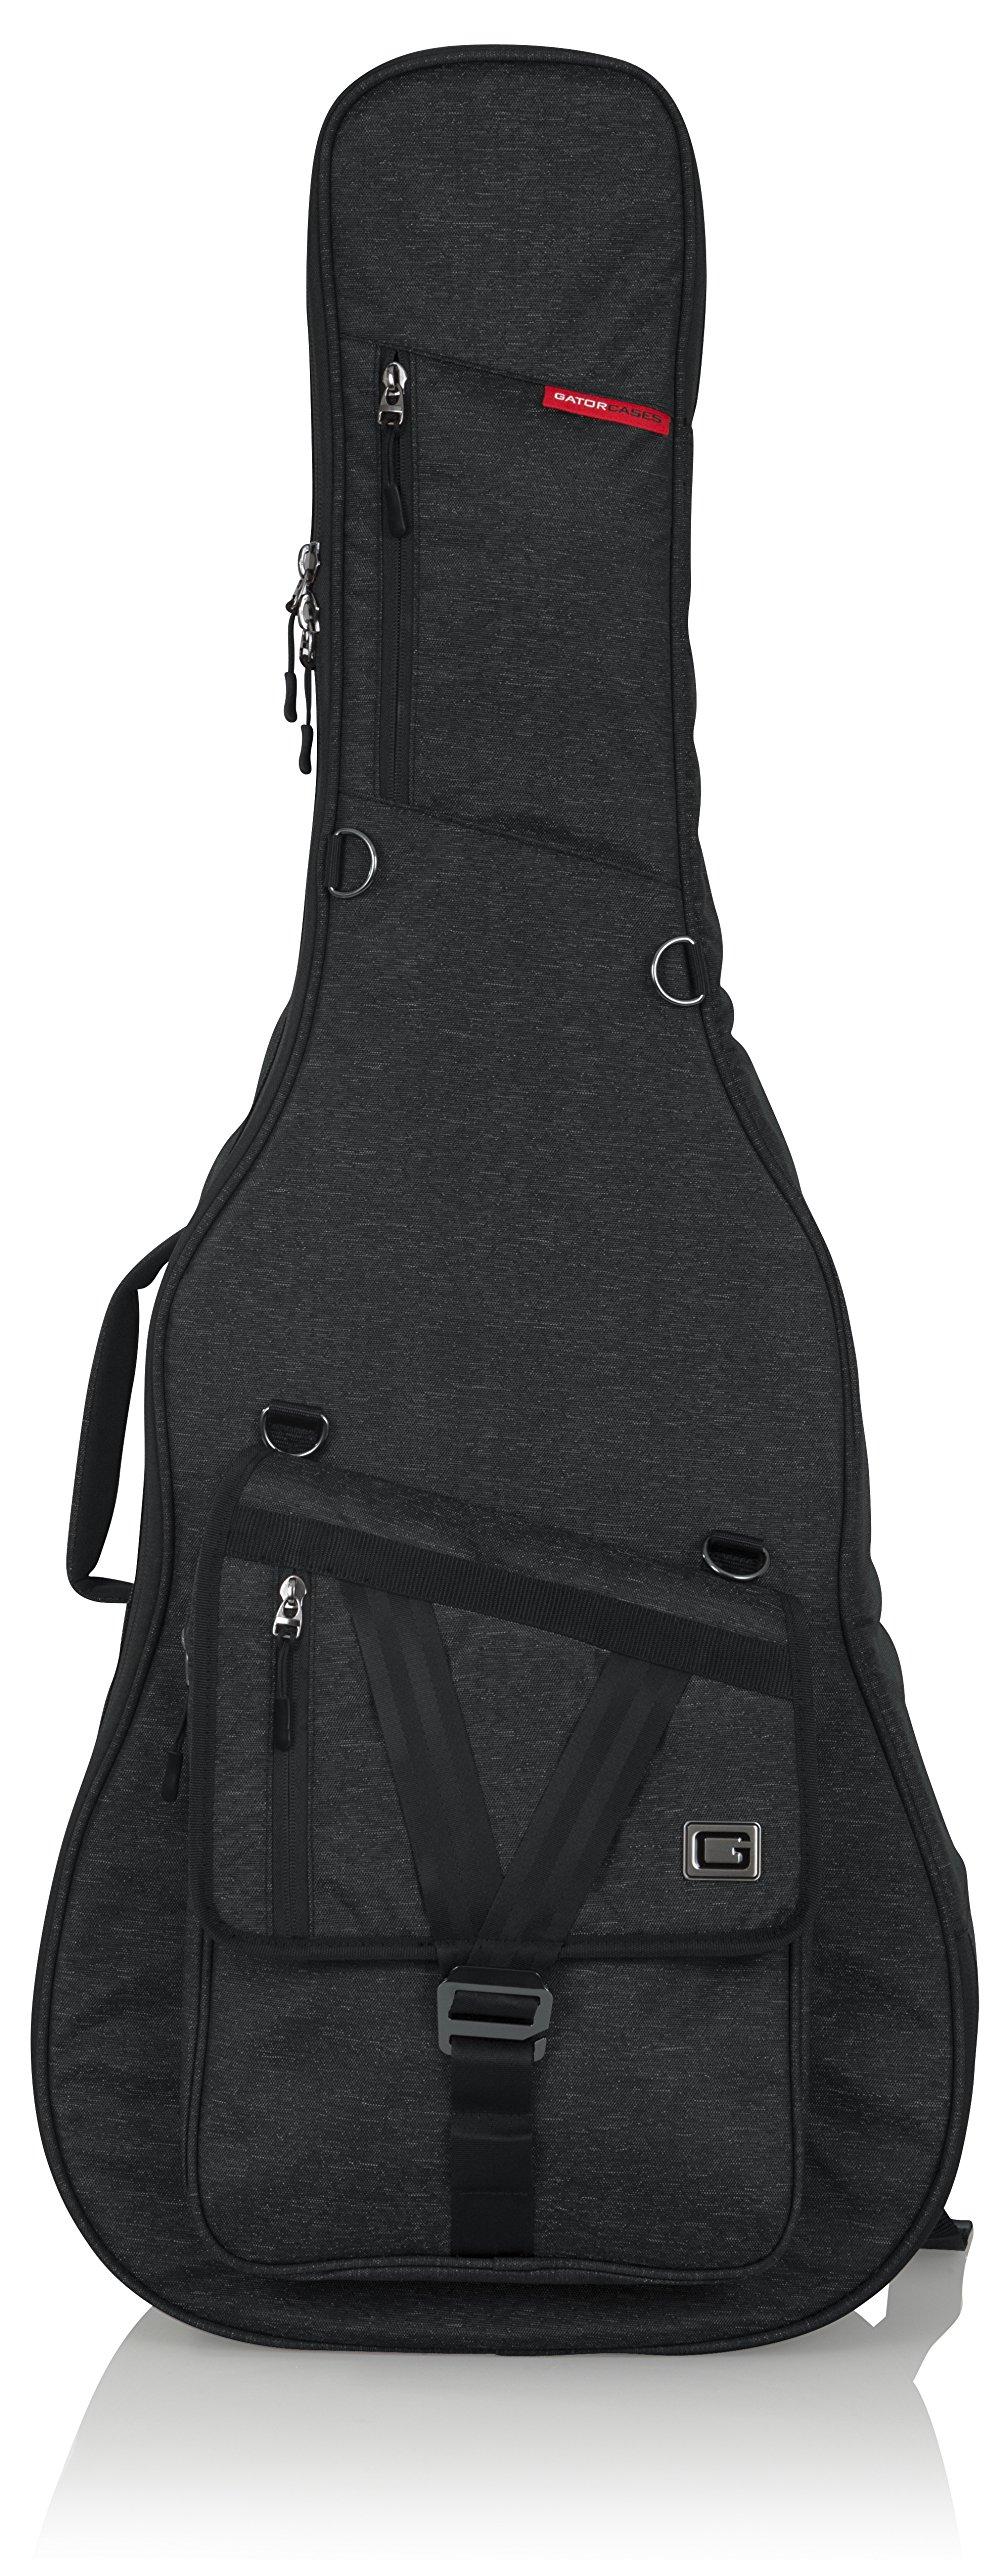 Gator Cases GT-ACOUSTIC-BLK Acoustic Guitar Bag